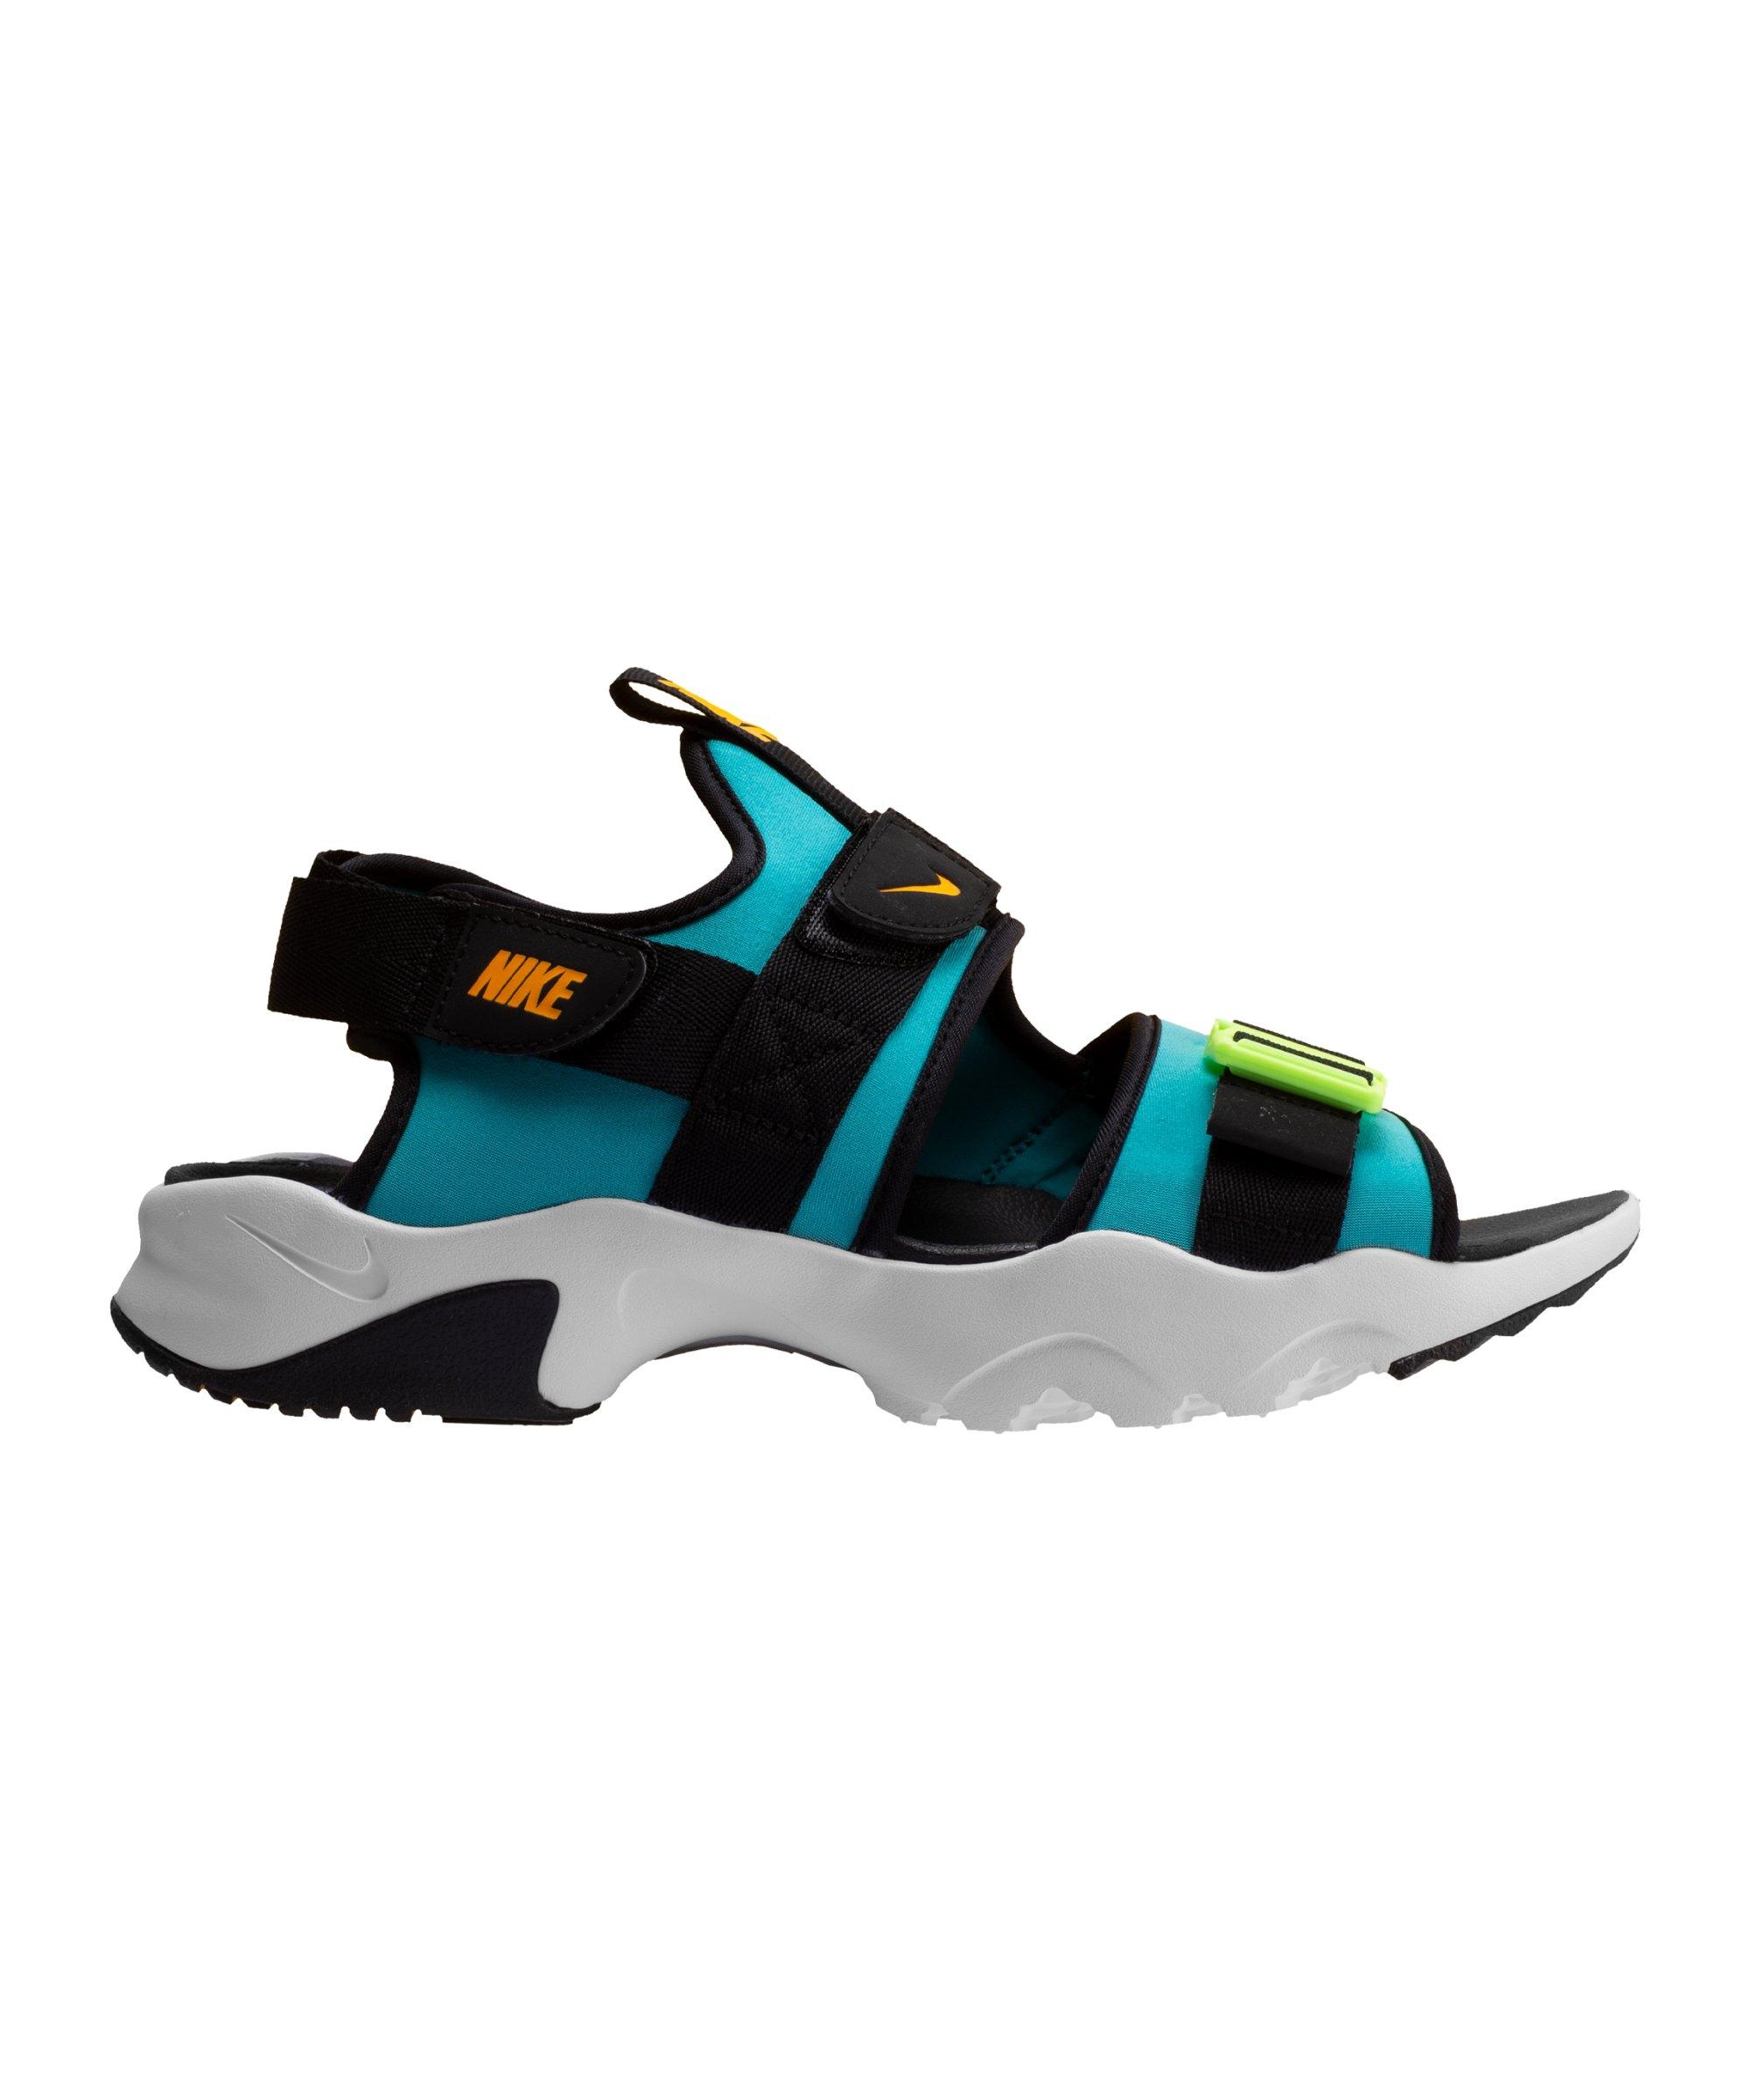 Nike Canyon Sandal Sandale Blau F300 - blau